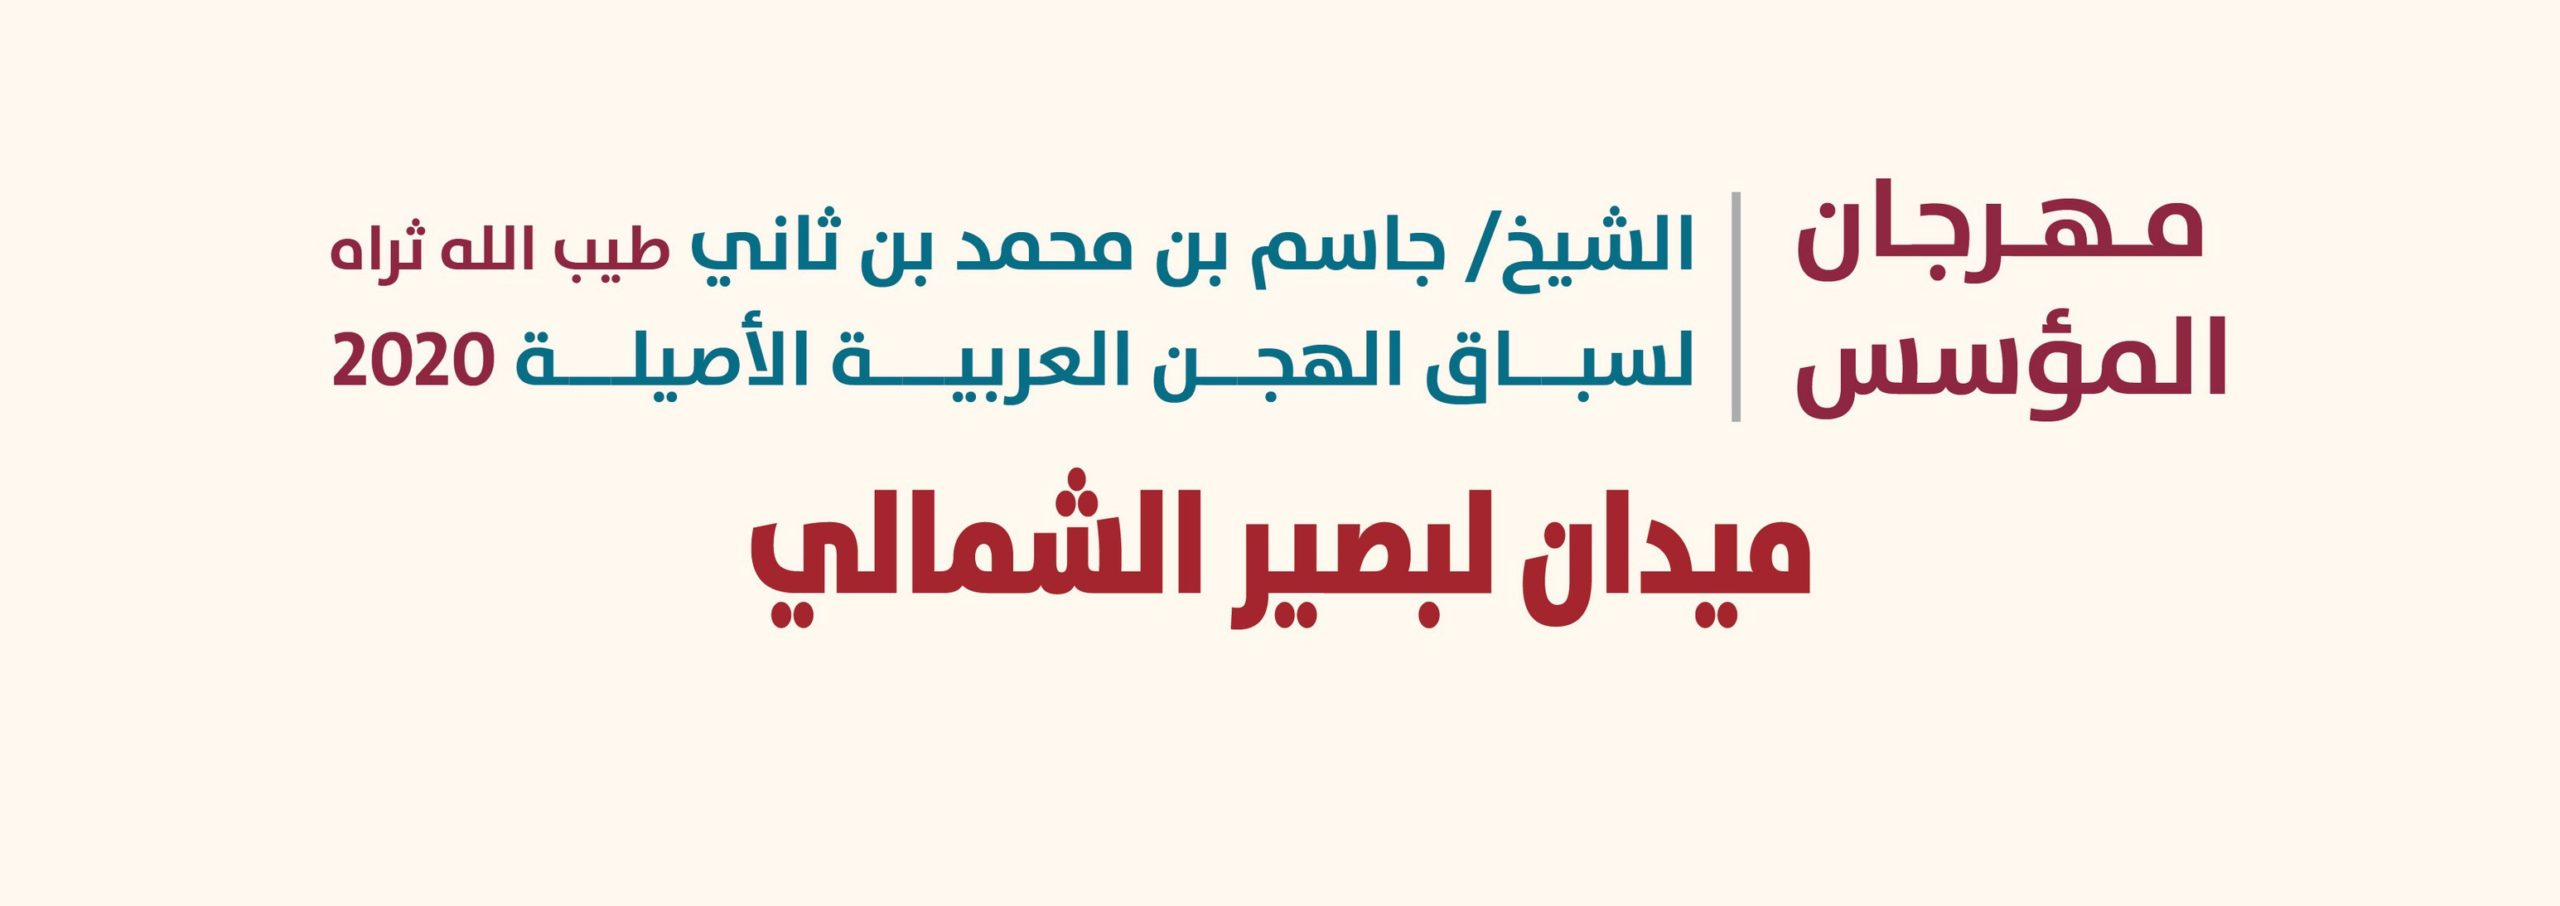 47 شوطاً يشهدها ميدان لبصير بمهرجان المؤسس